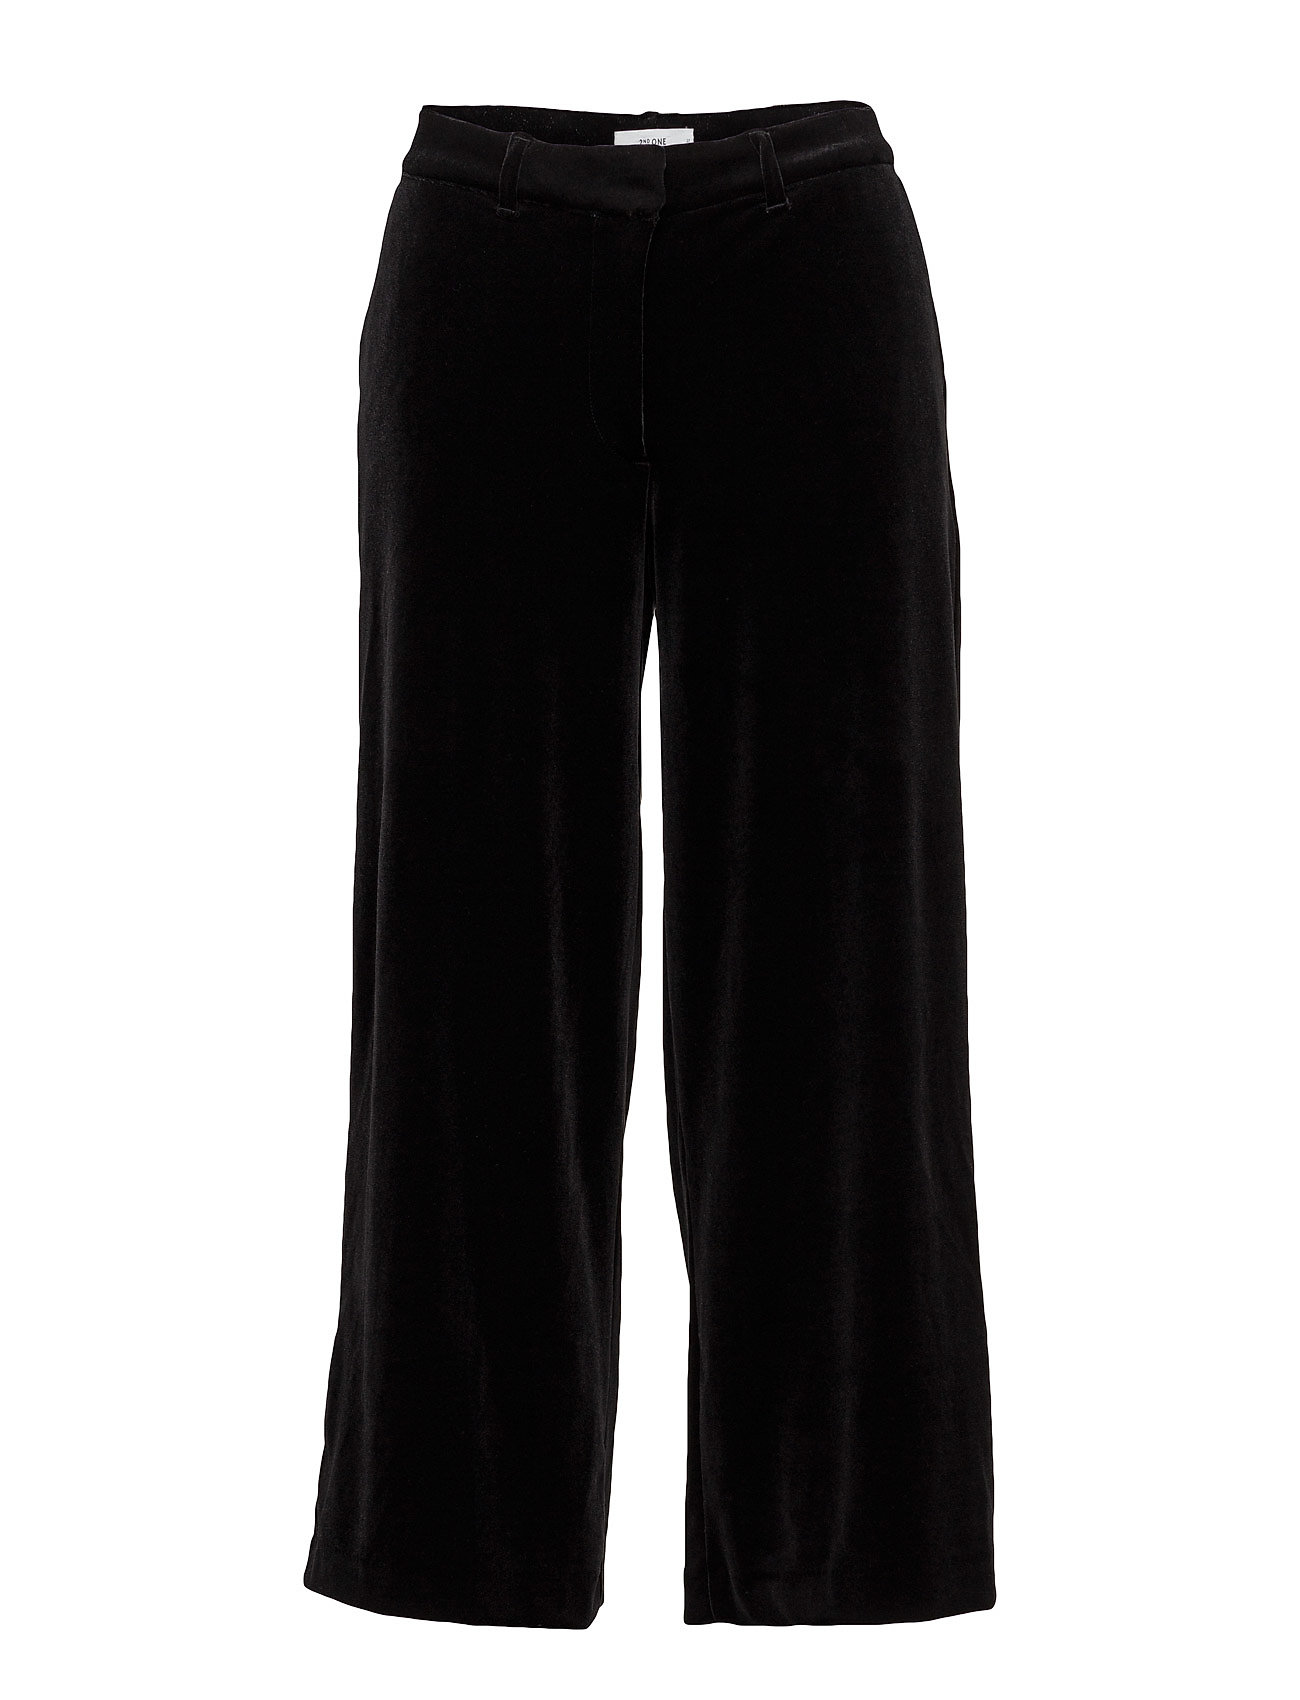 2nd one Eloise 103 crop, black velvet, pants på boozt.com dk